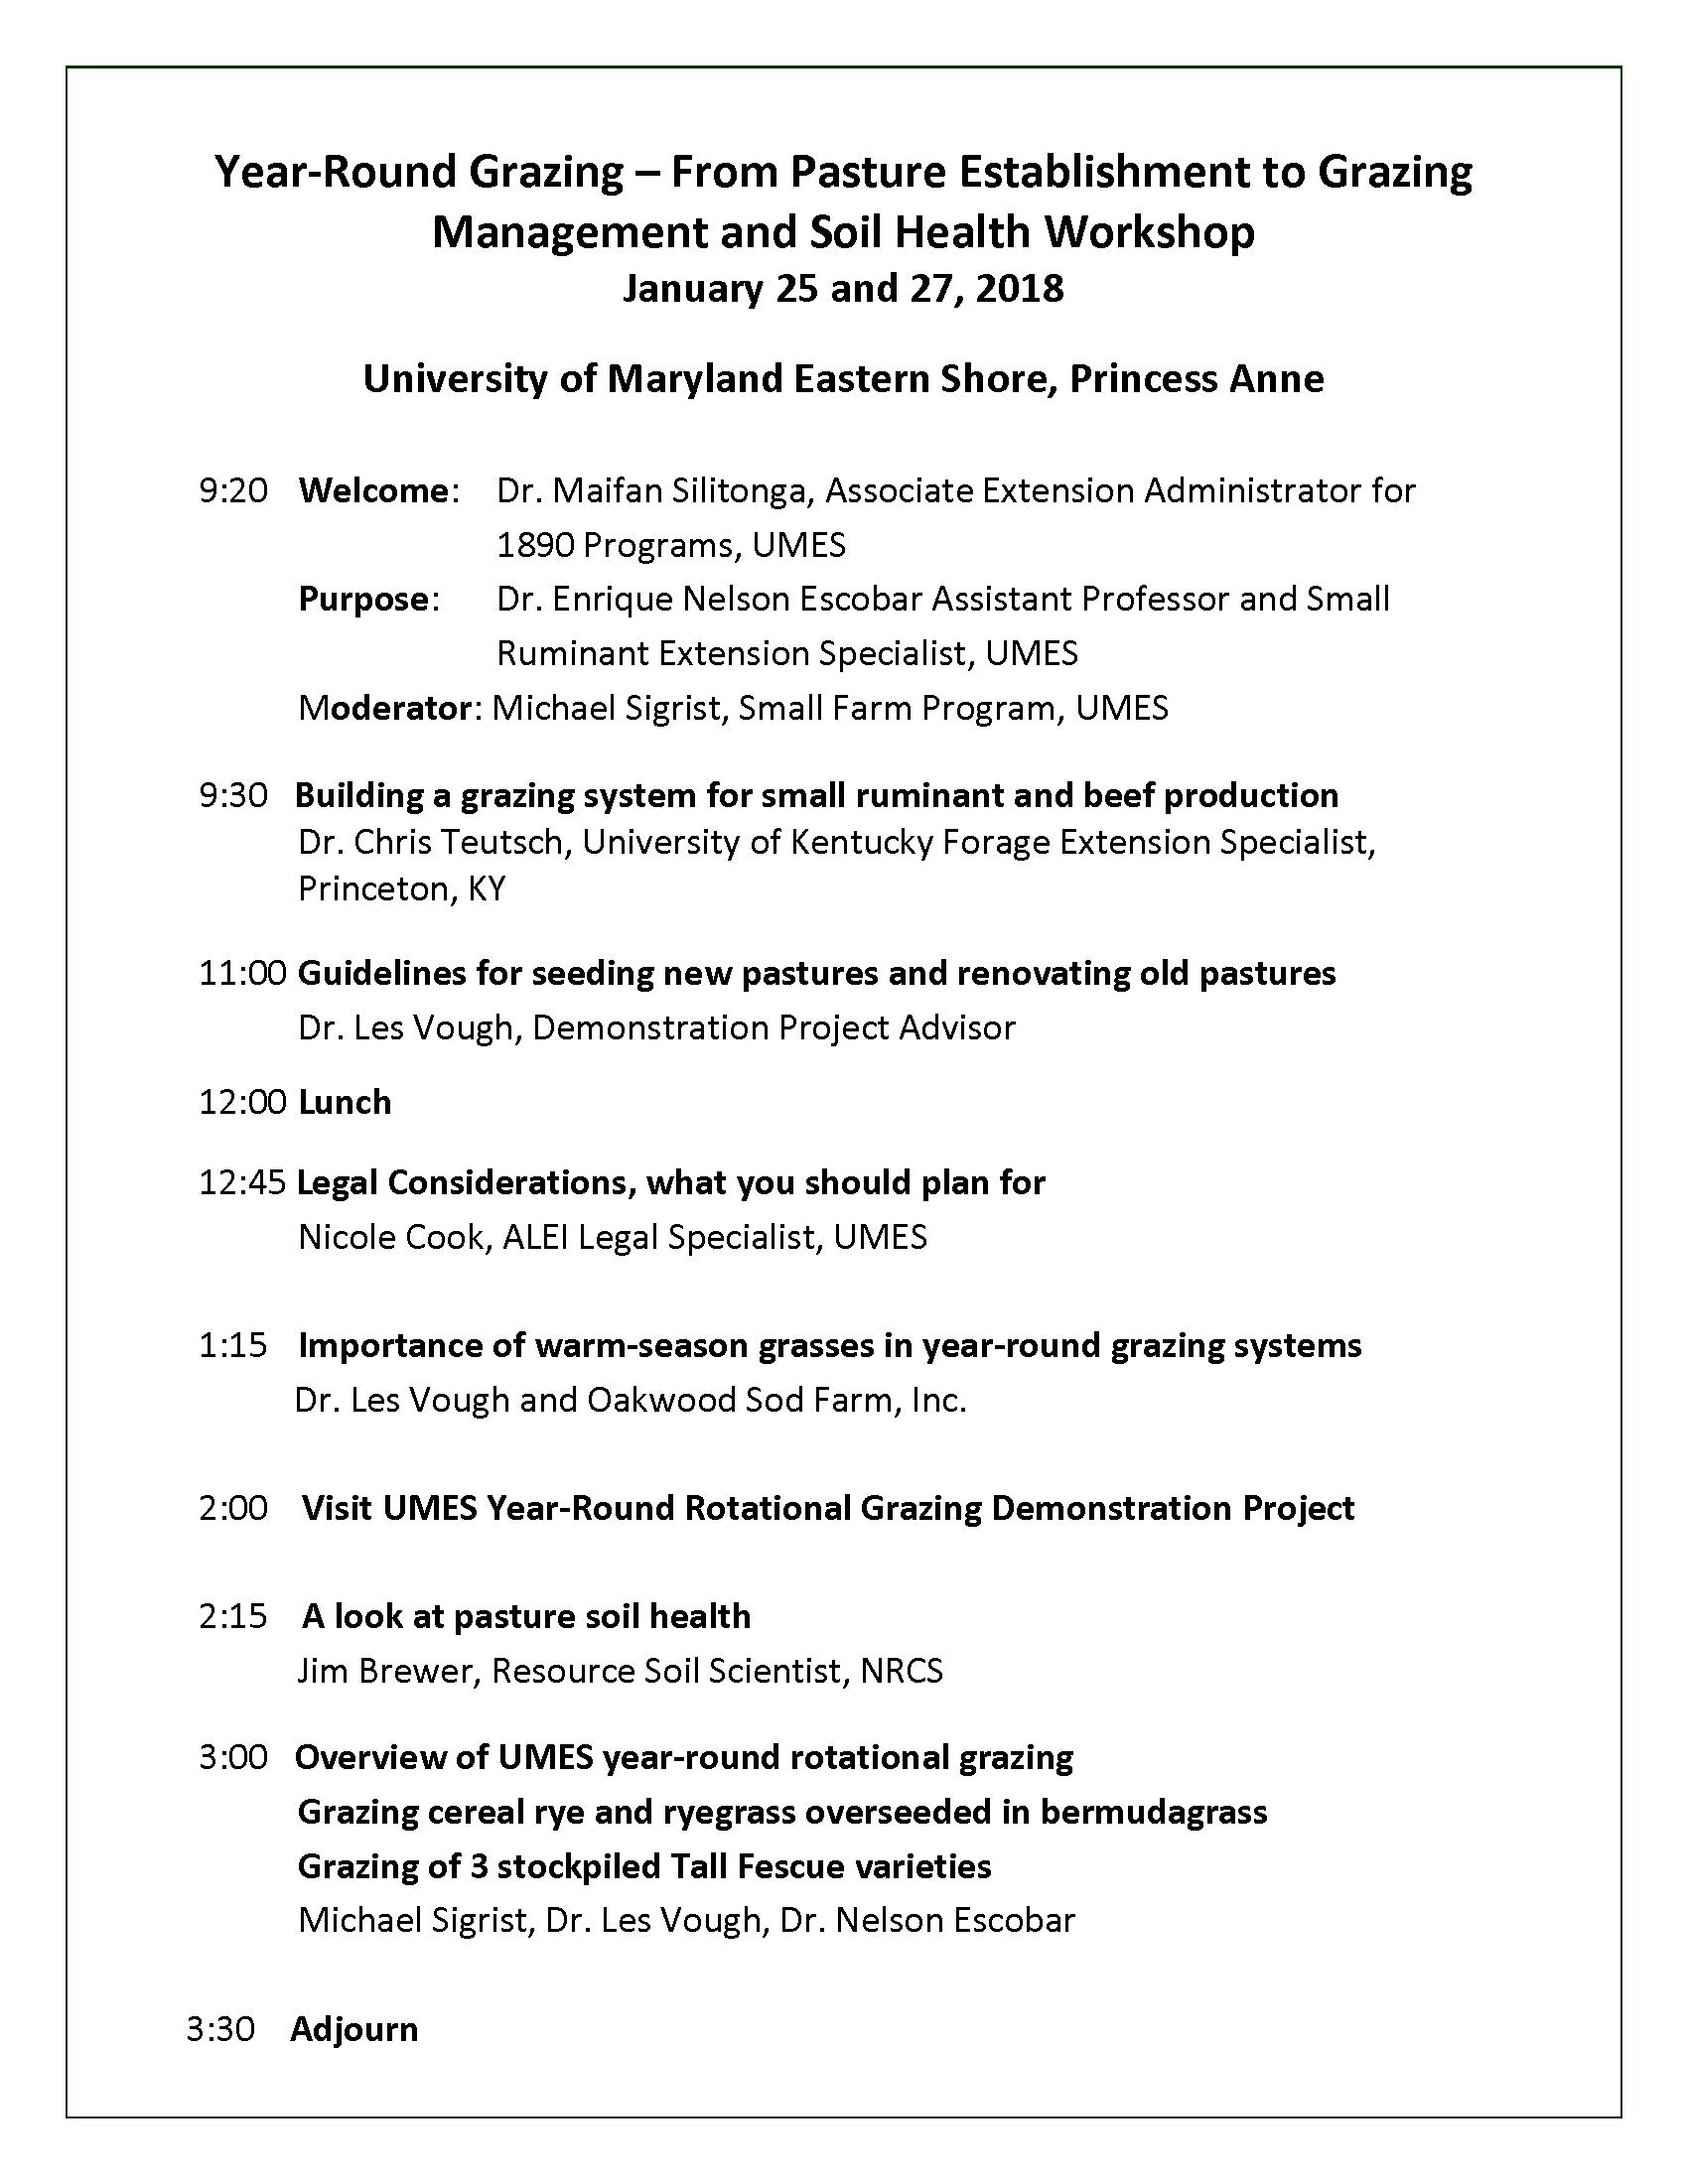 Grazing Workshop Agenda